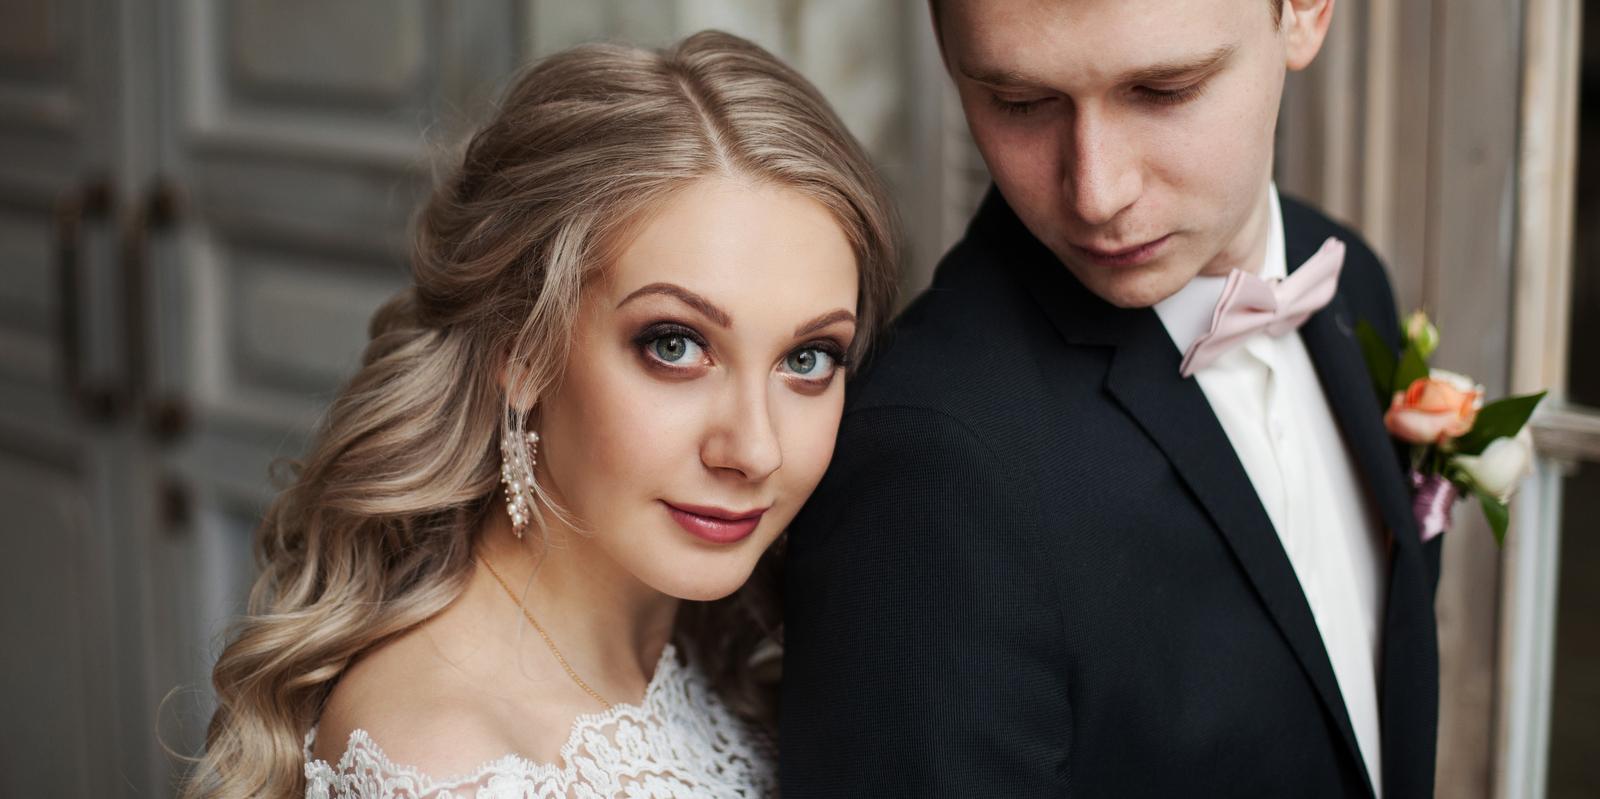 Свадебное фото и видео на свадьбу